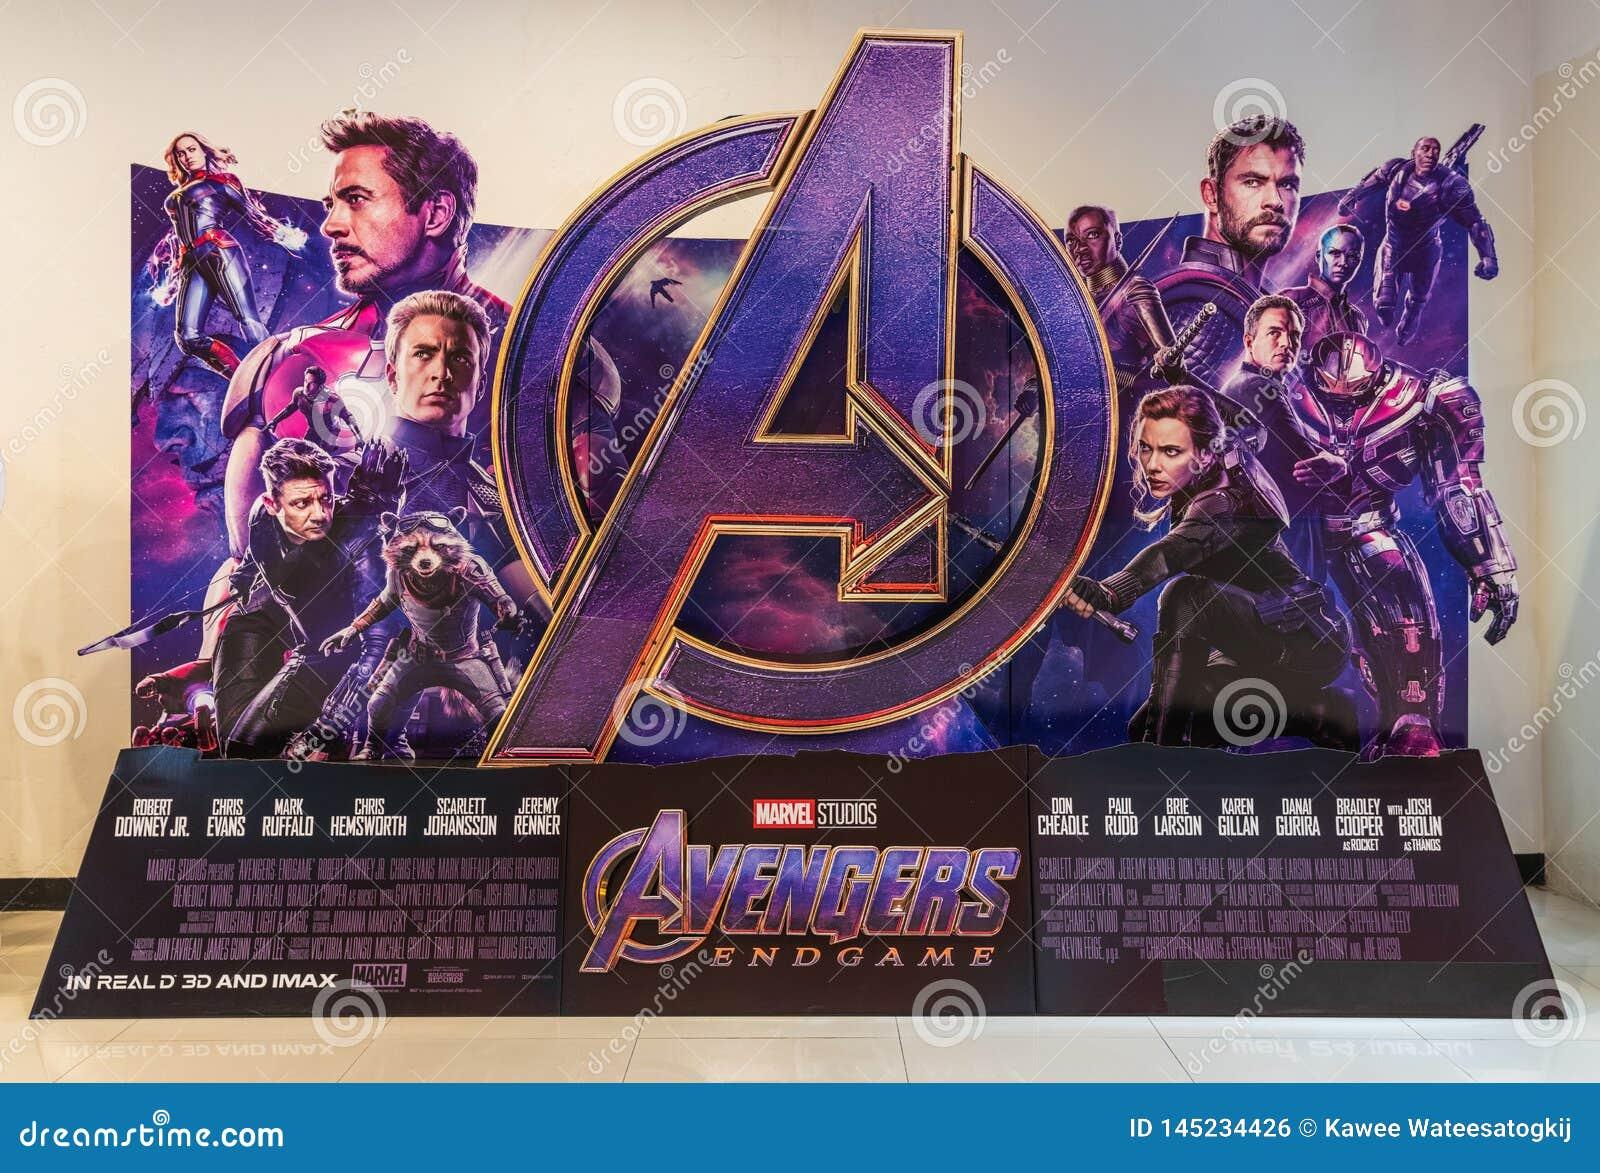 Bangkok, Thailand - Apr 18, 2019: Avenger Endgame movie backdrop display in movie theatre. Cinema promotional advertisement